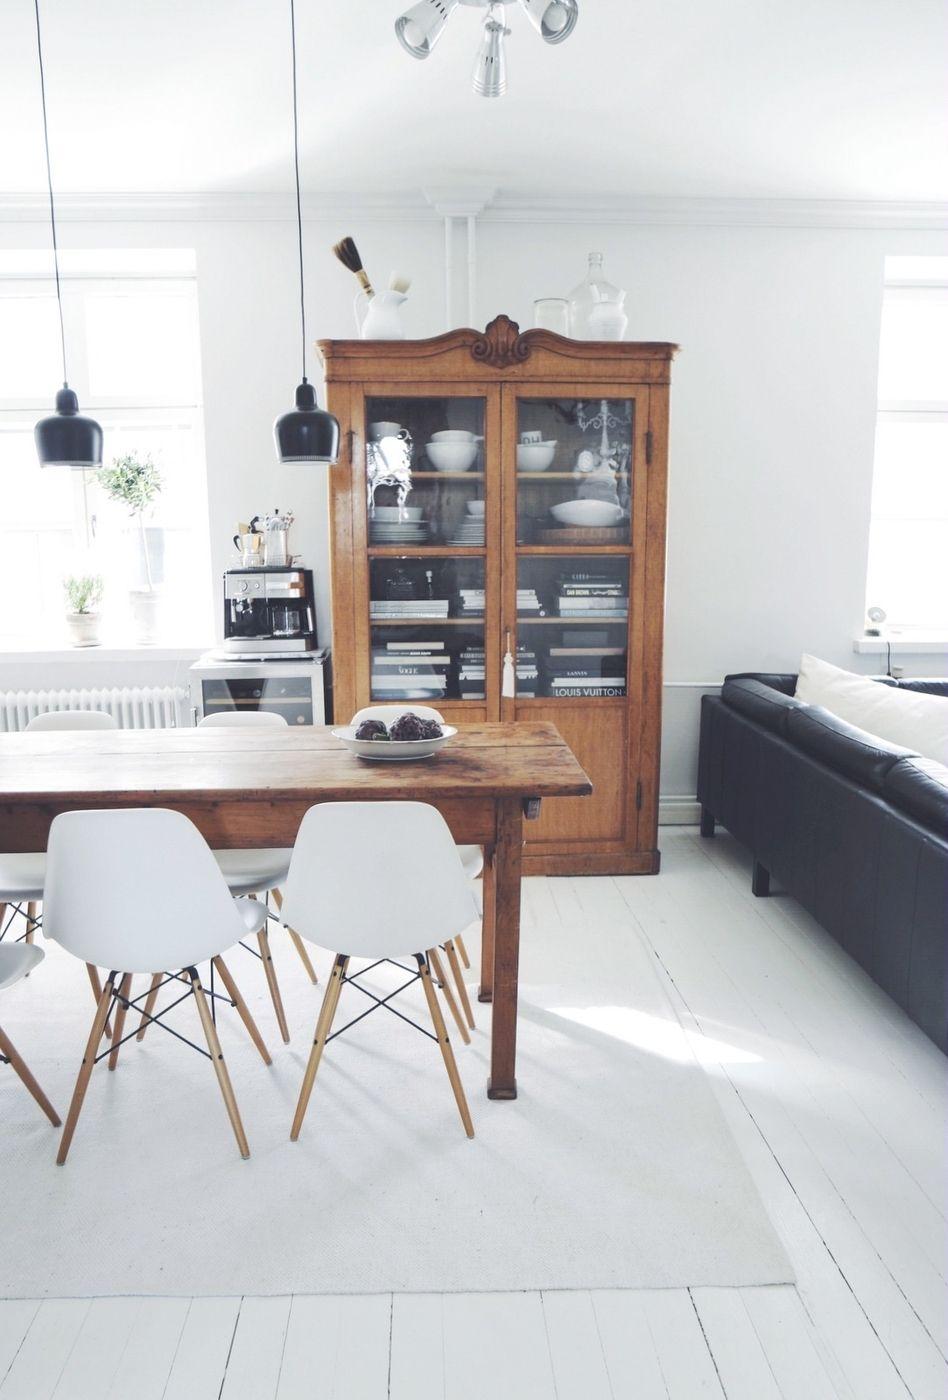 Comedor Estilo Nórdico con sillas Réplica Eames y Vitrina de Madera